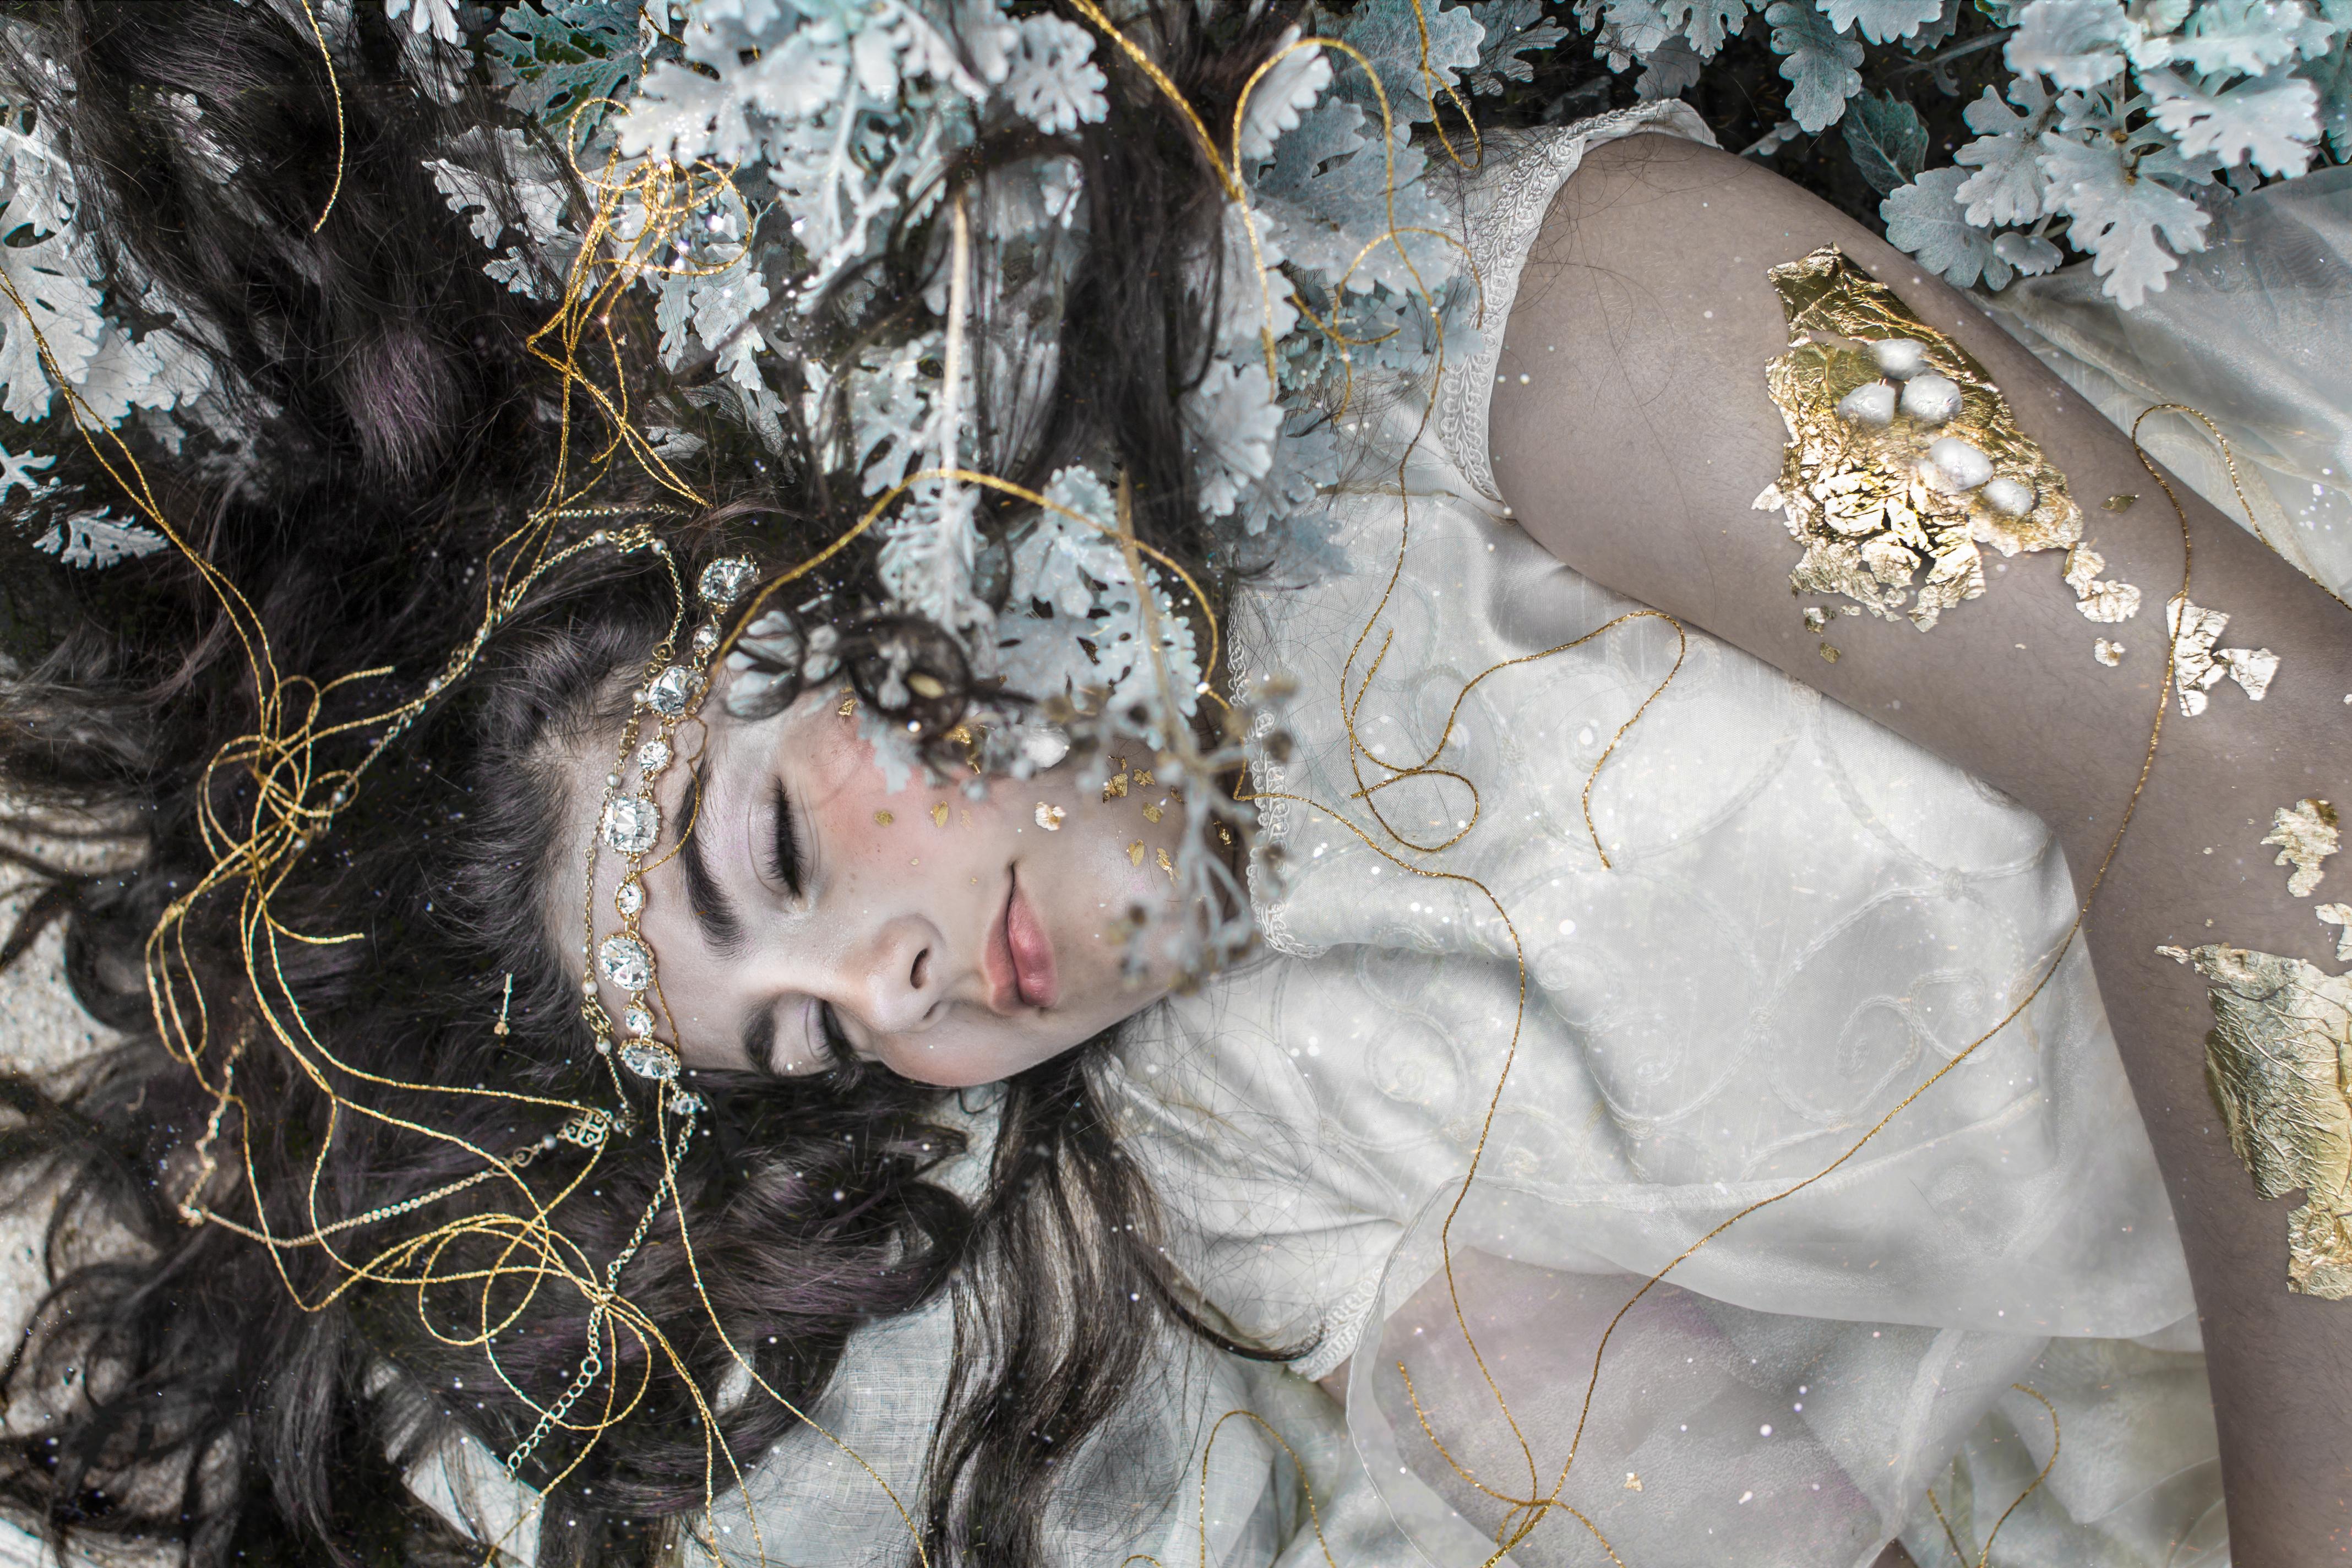 The Deep Slumber of Princess Tethys